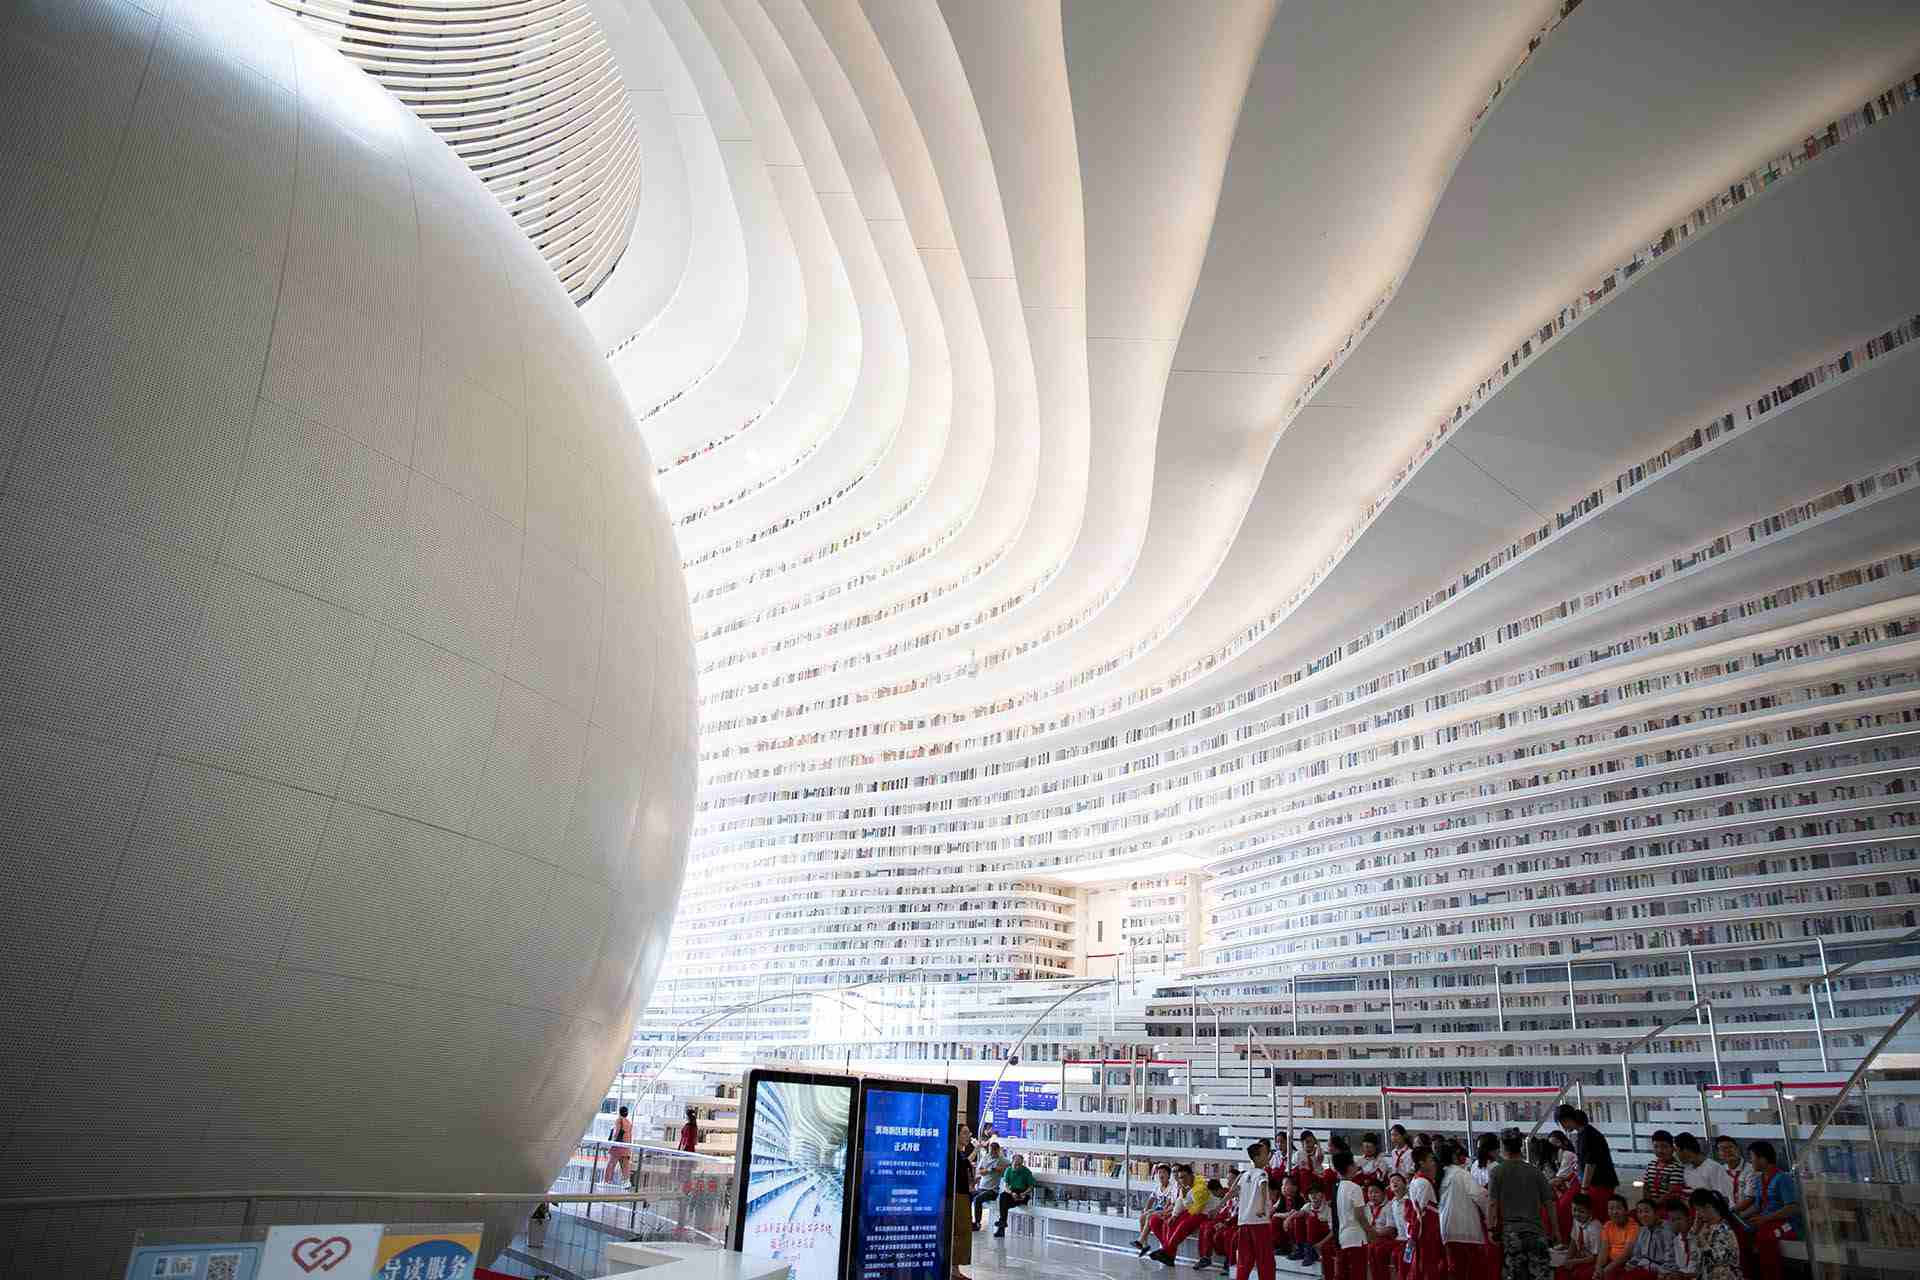 A glimpse of the Tianjin Binhai New Area Cultural Center